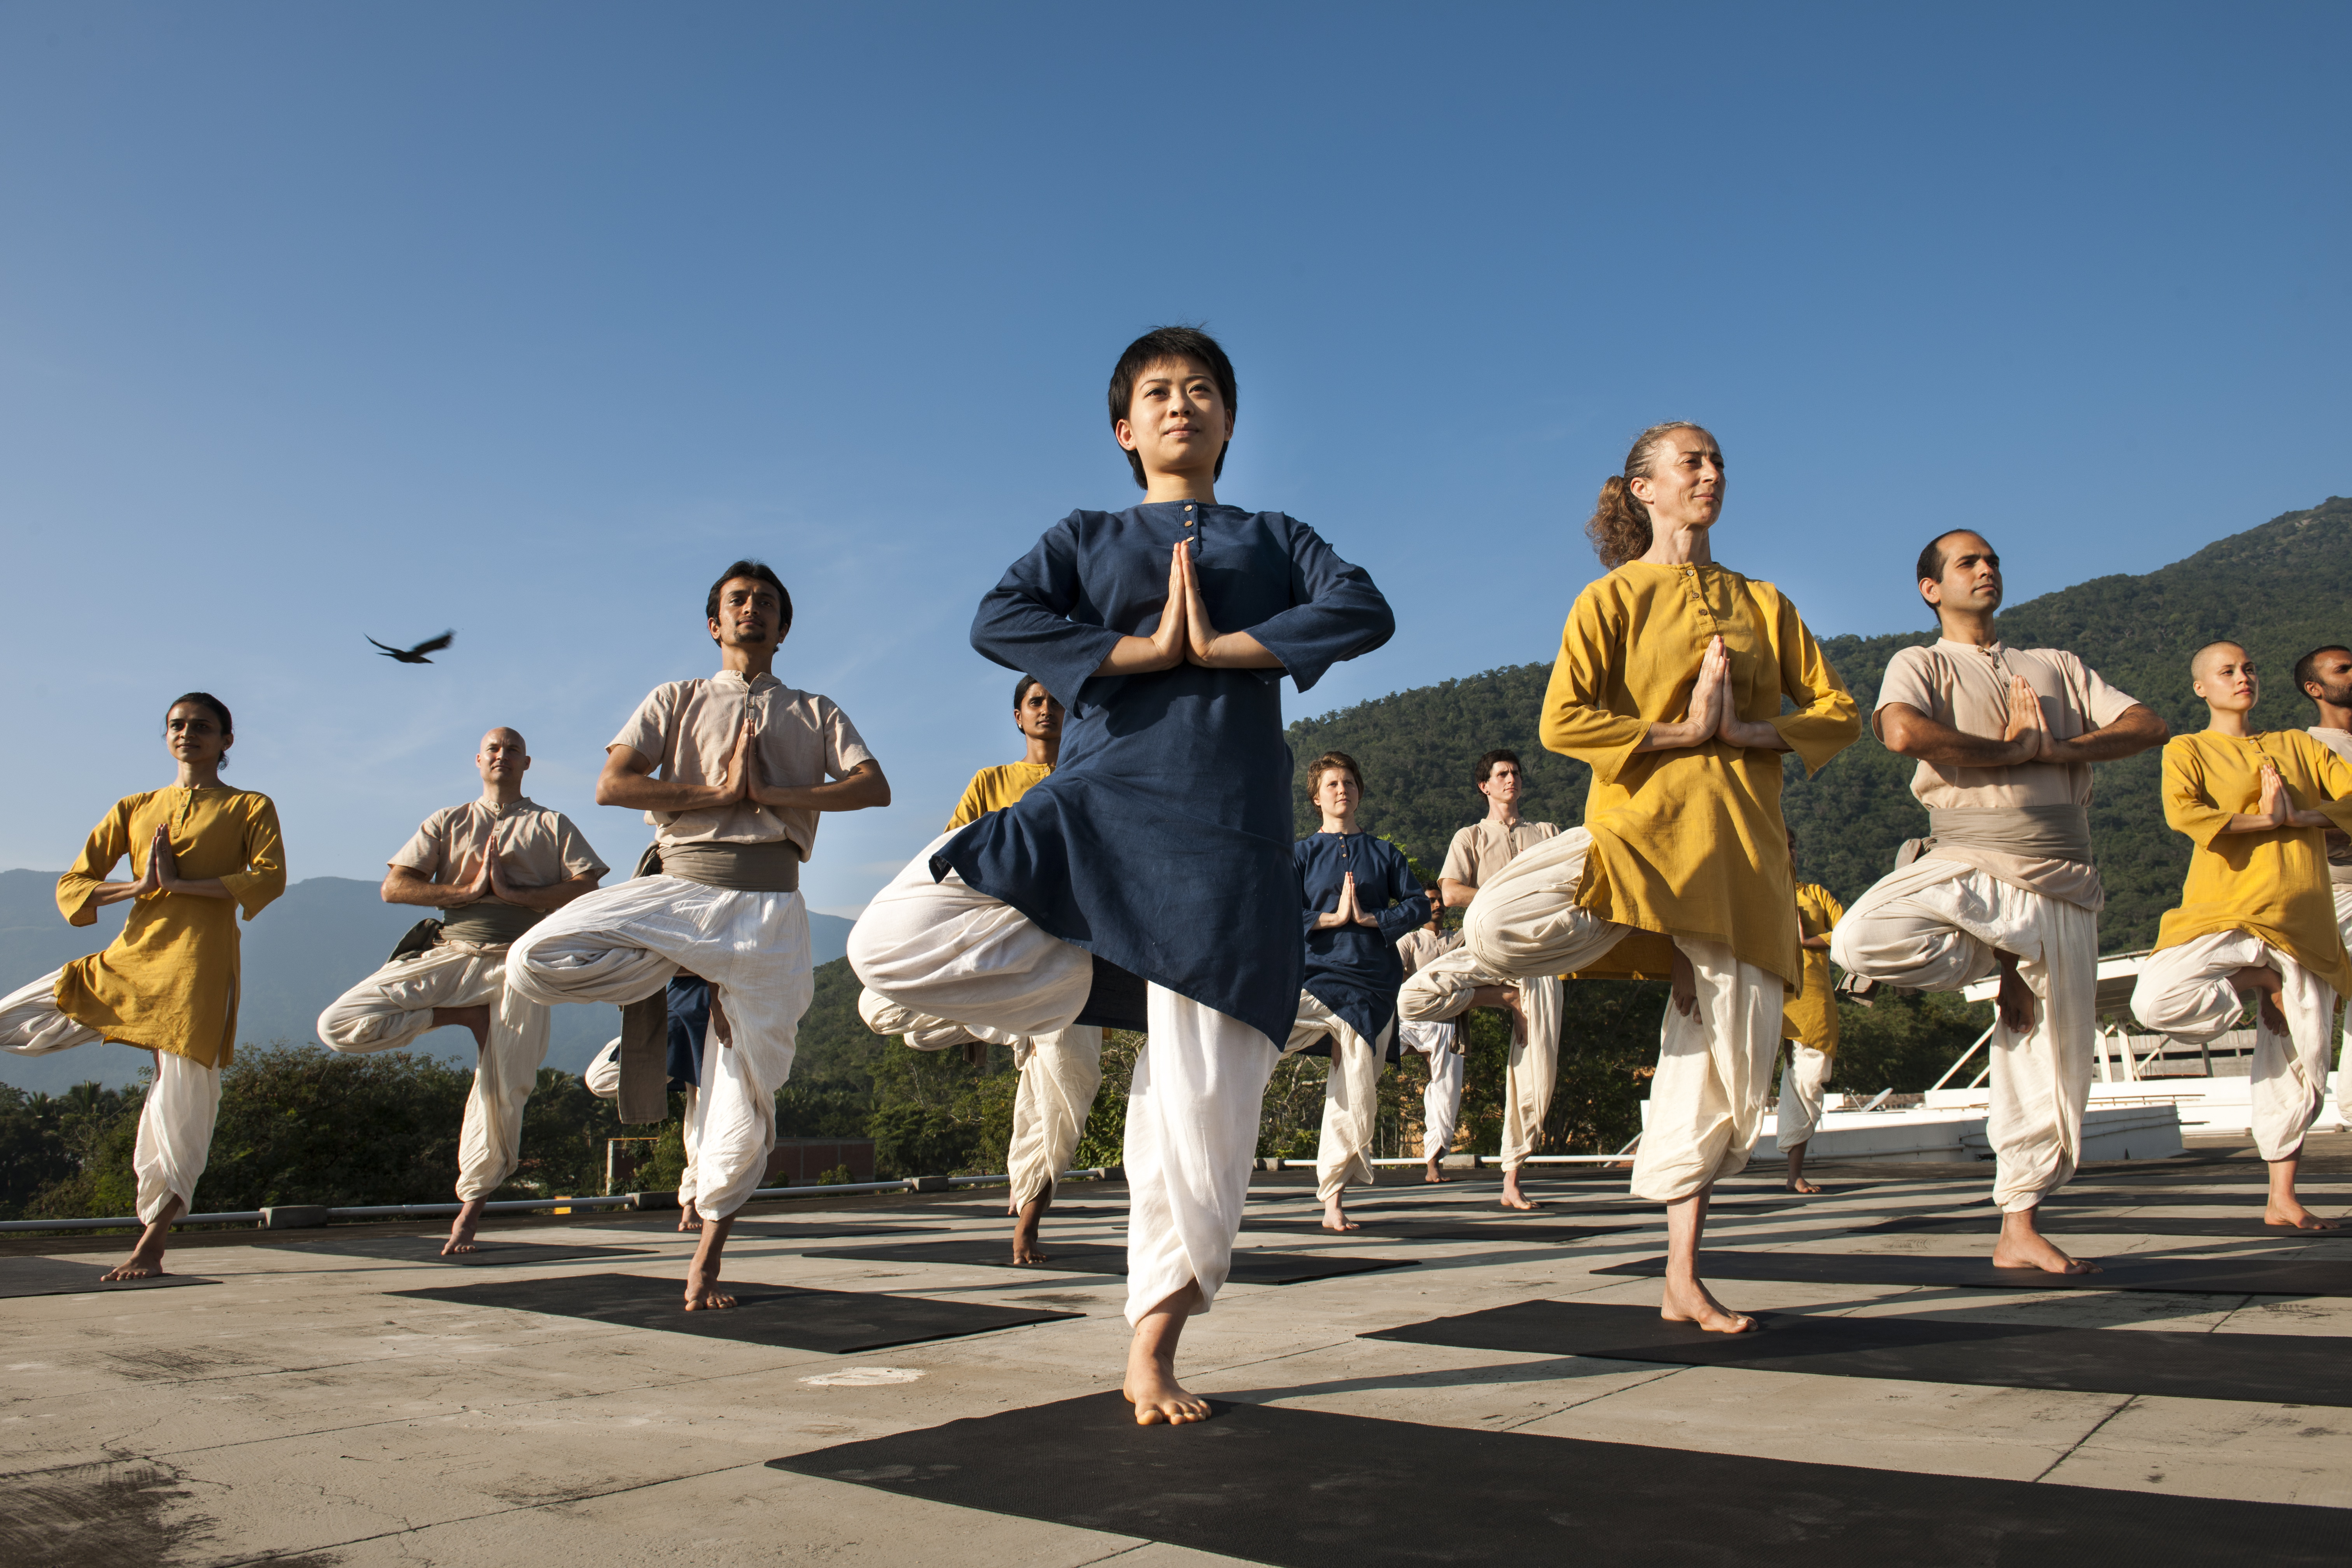 Yogasanas-standing